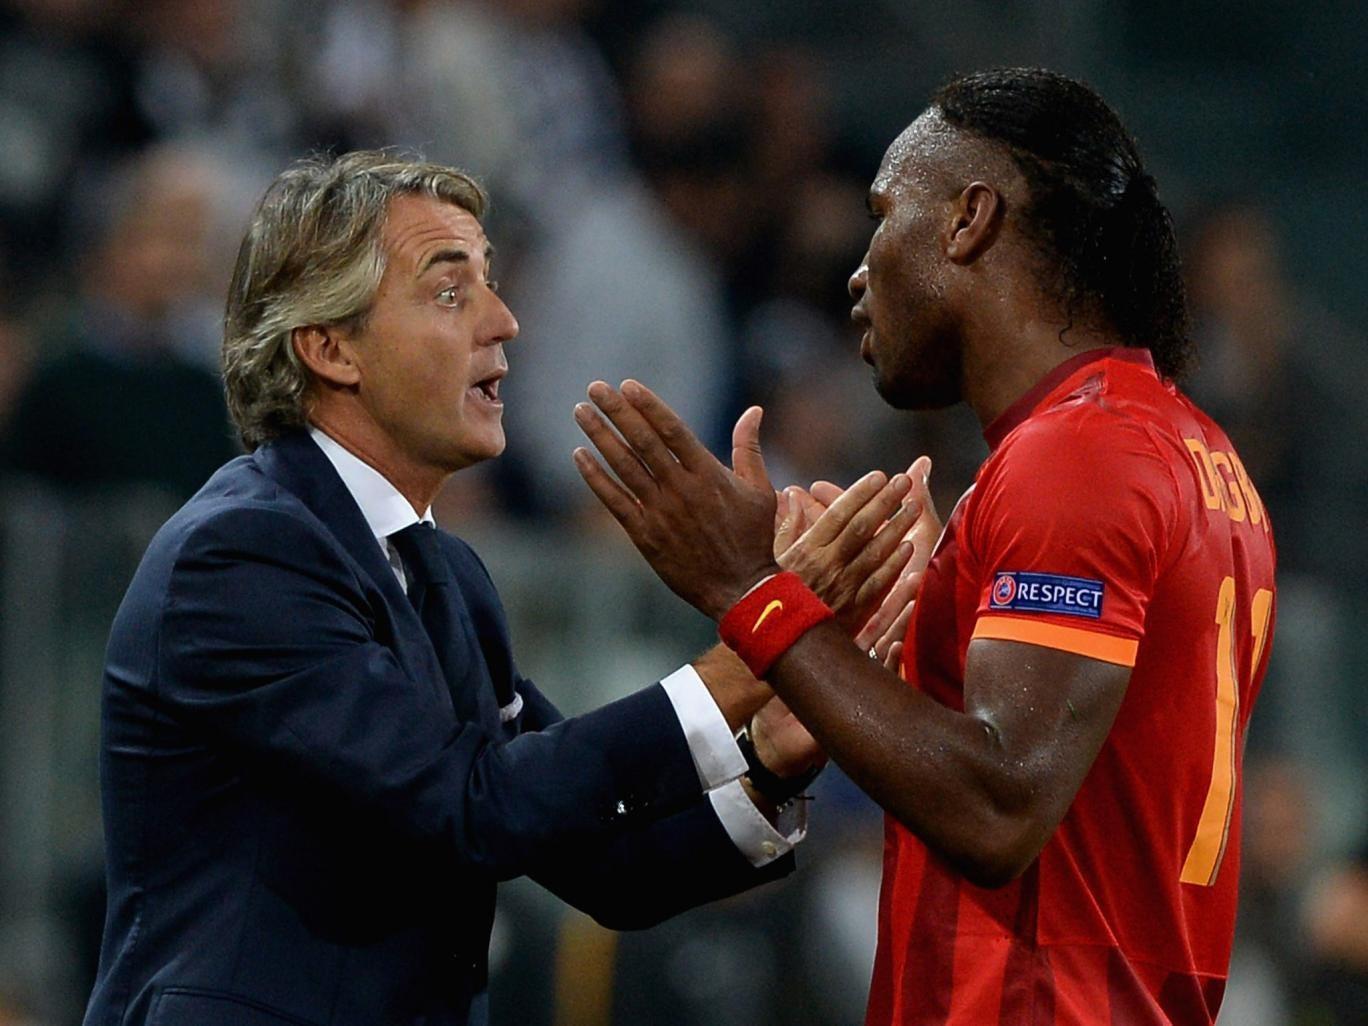 Roberto Mancini talks with Didier Drogba